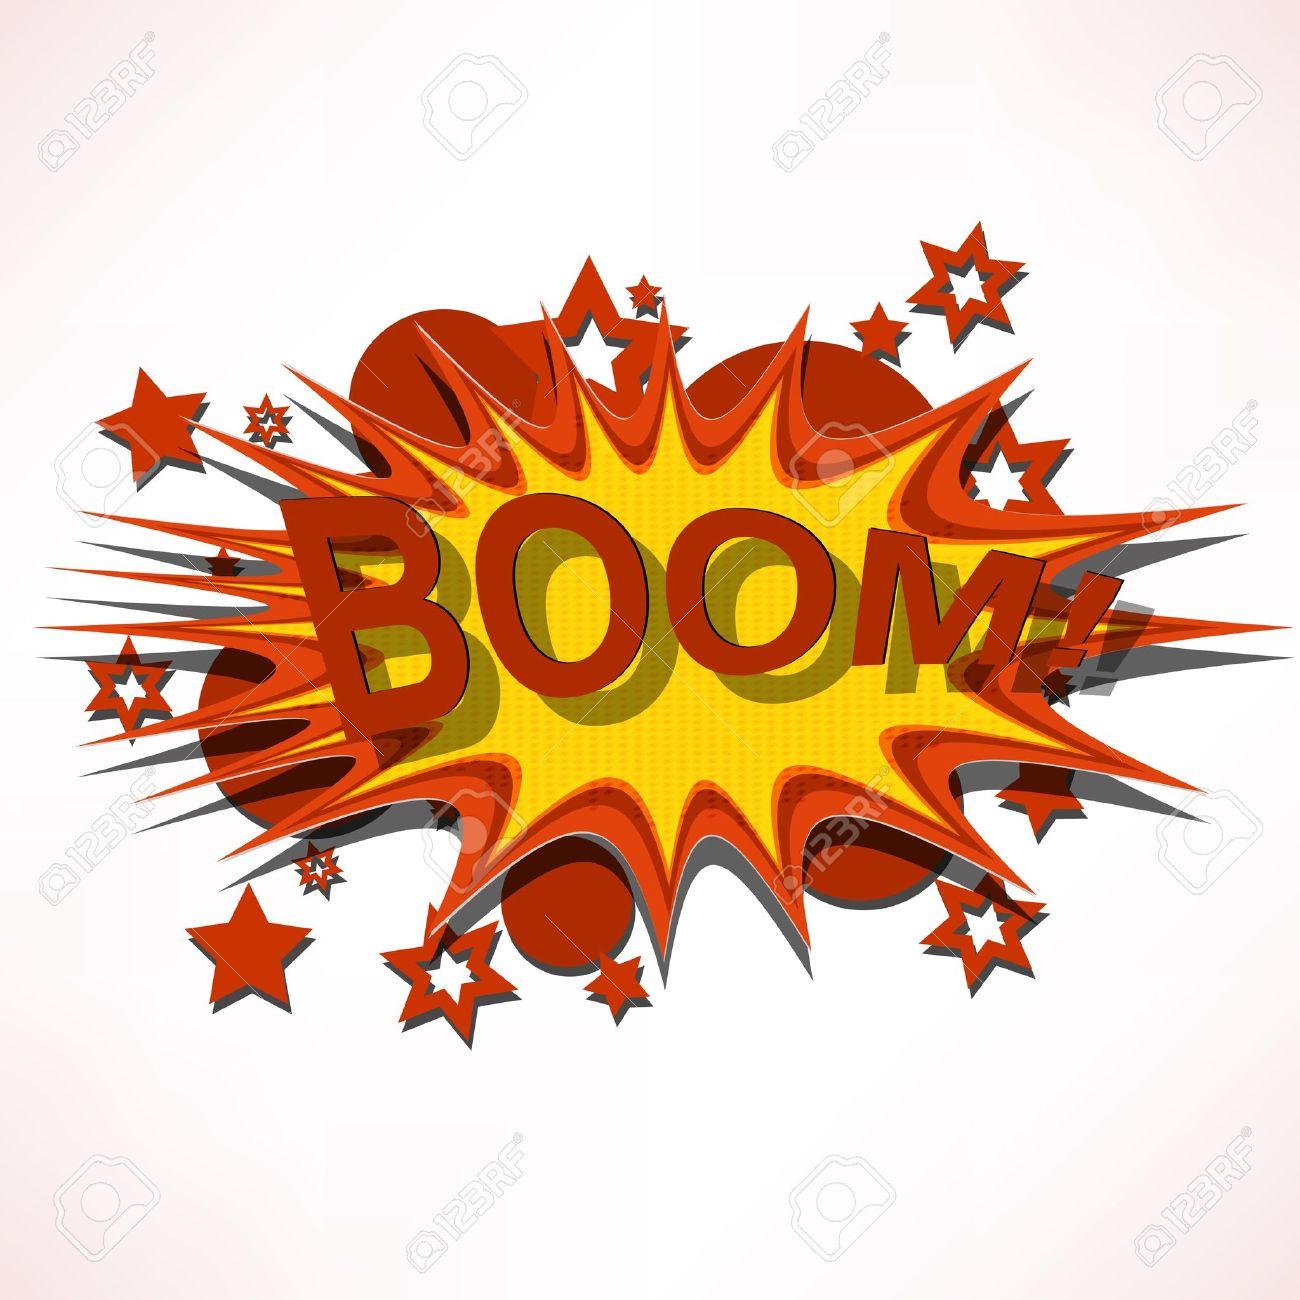 https://previews.123rf.com/images/berkut2011/berkut20111208/berkut2011120800019/14747476-boom-comic-book-explosion-.jpg